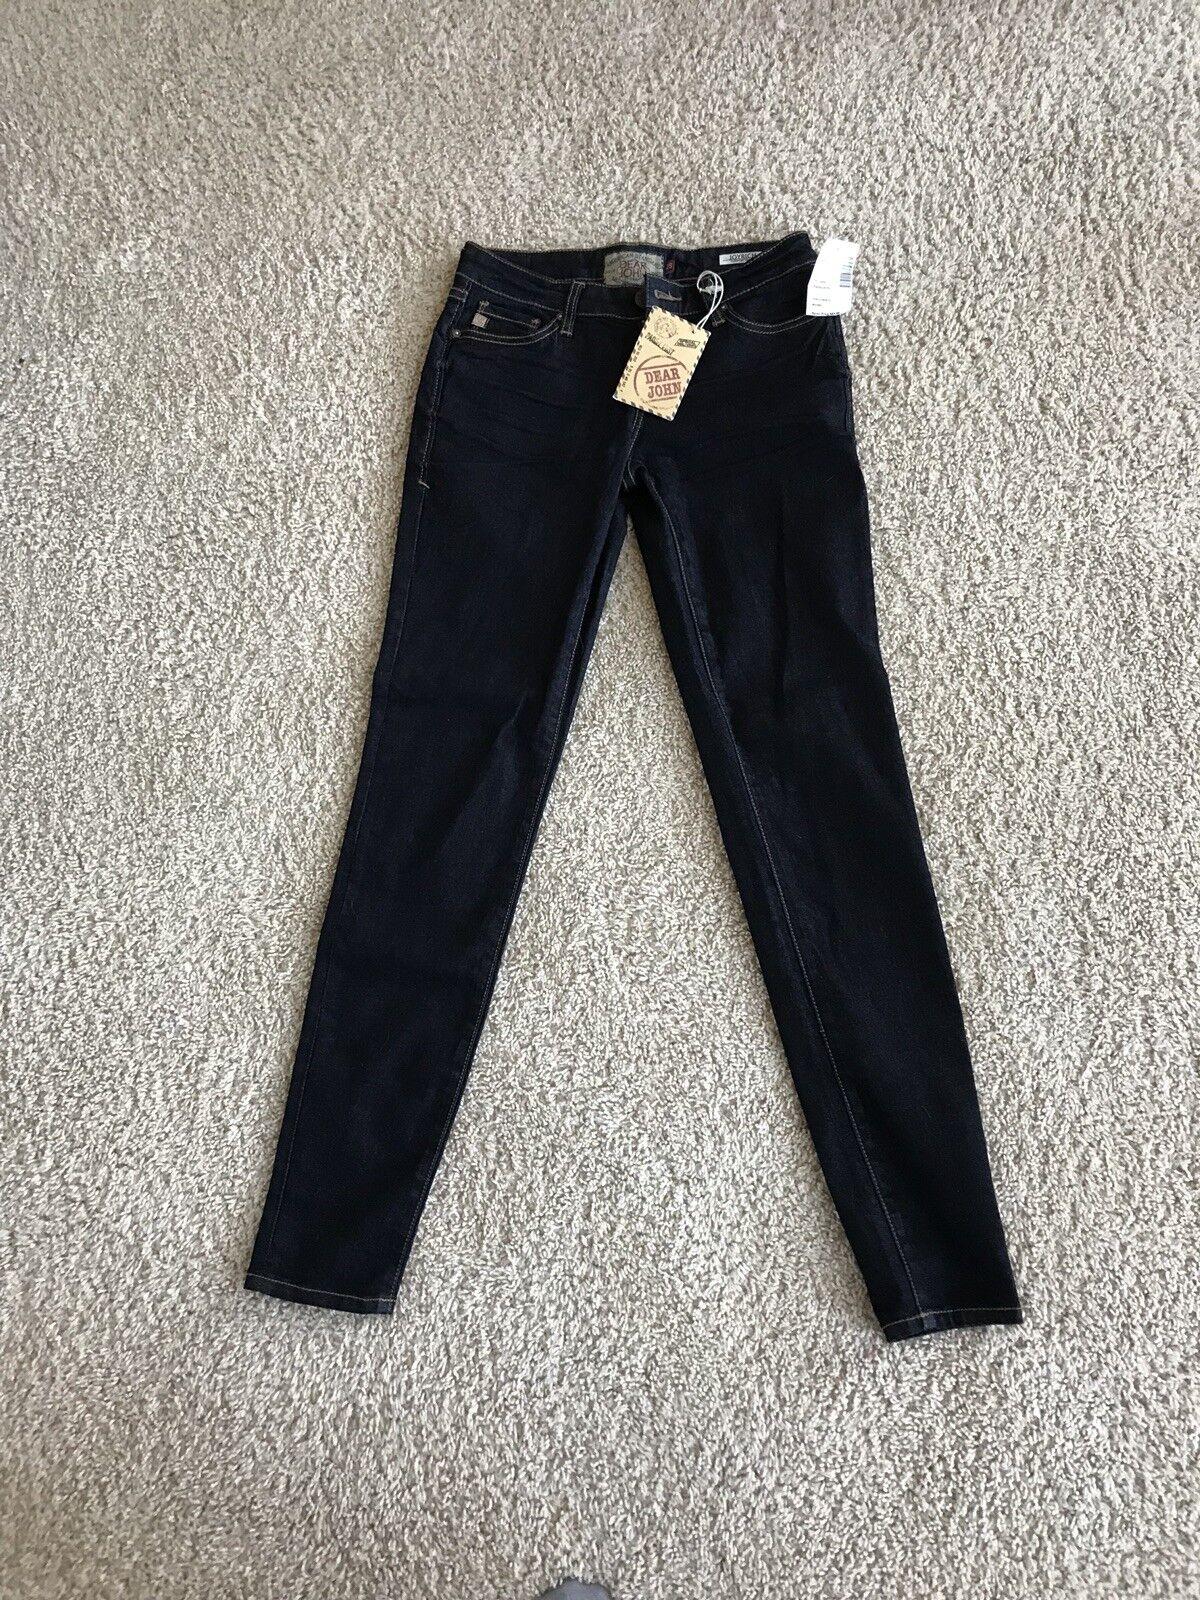 Dear John Denim JOYRICH Skinny Jeans Sz 25